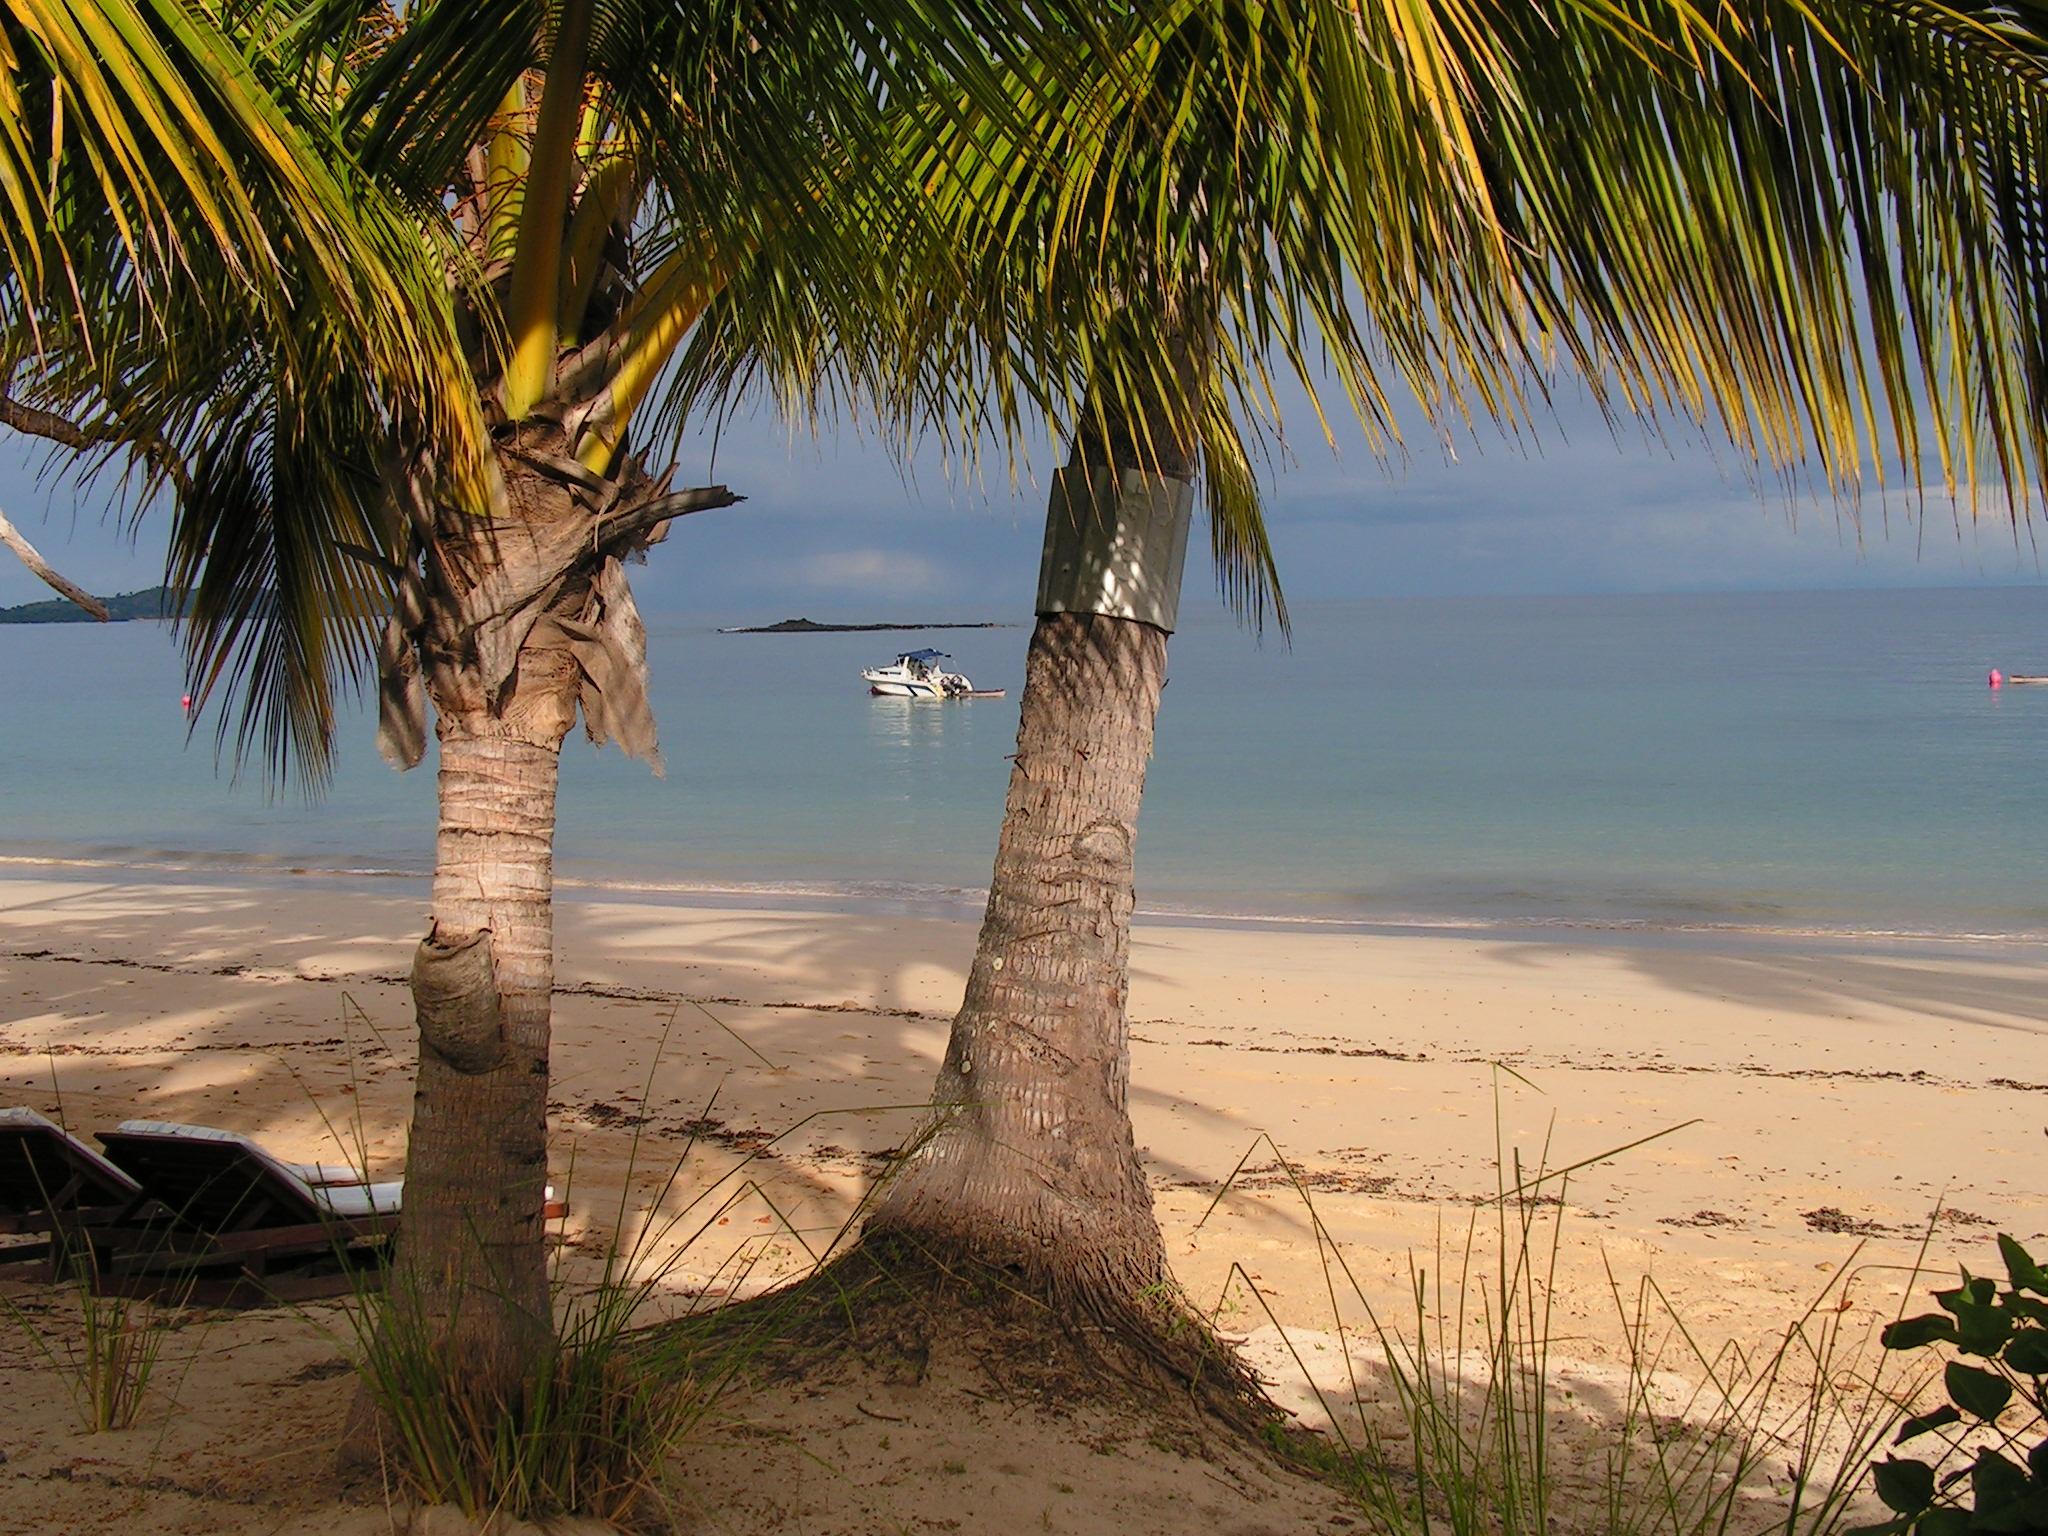 Highlights - Africa - Madagascar - Beaches 5.